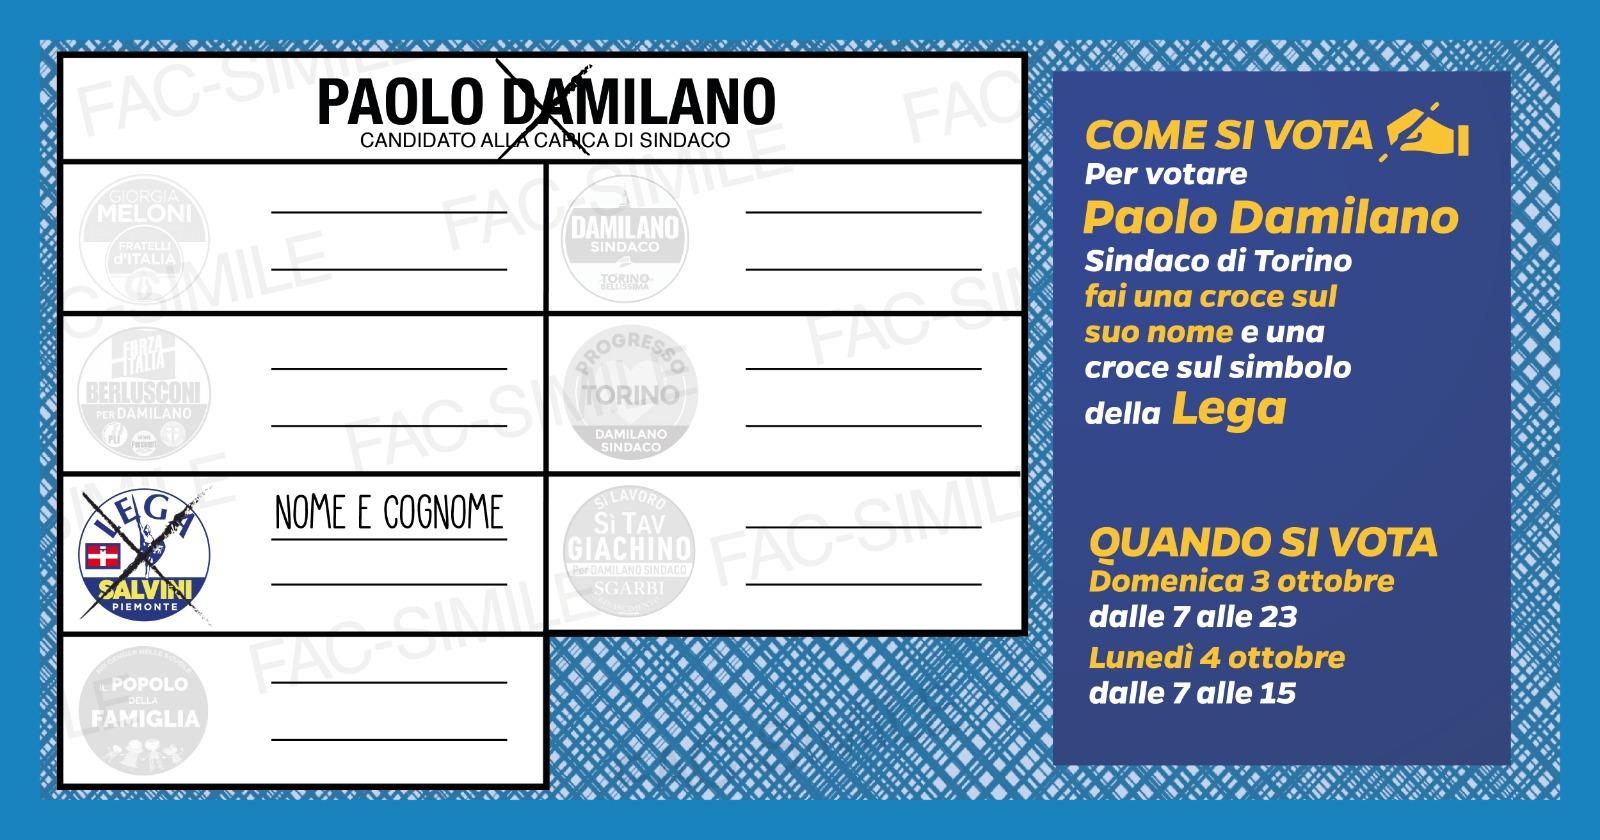 Come si vota a Torino